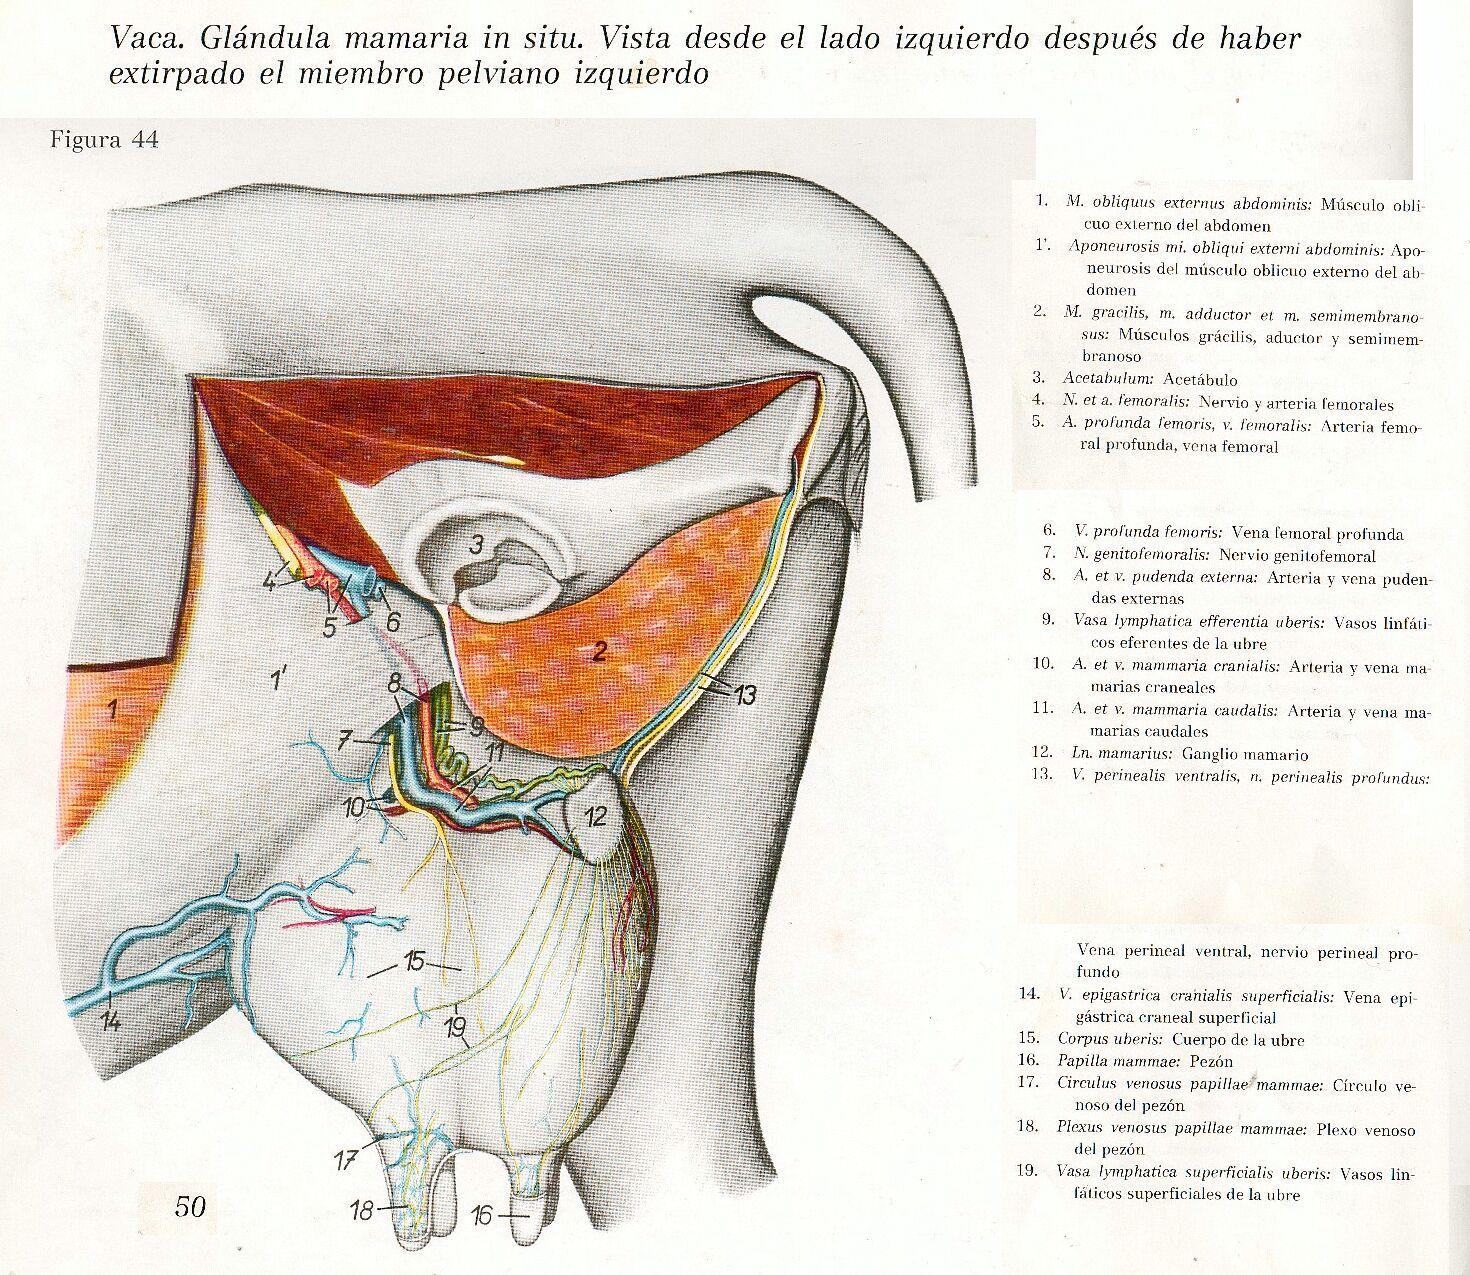 Pin de Luz Mery en ANIMALES | Pinterest | Anatomía, Anatomía animal ...